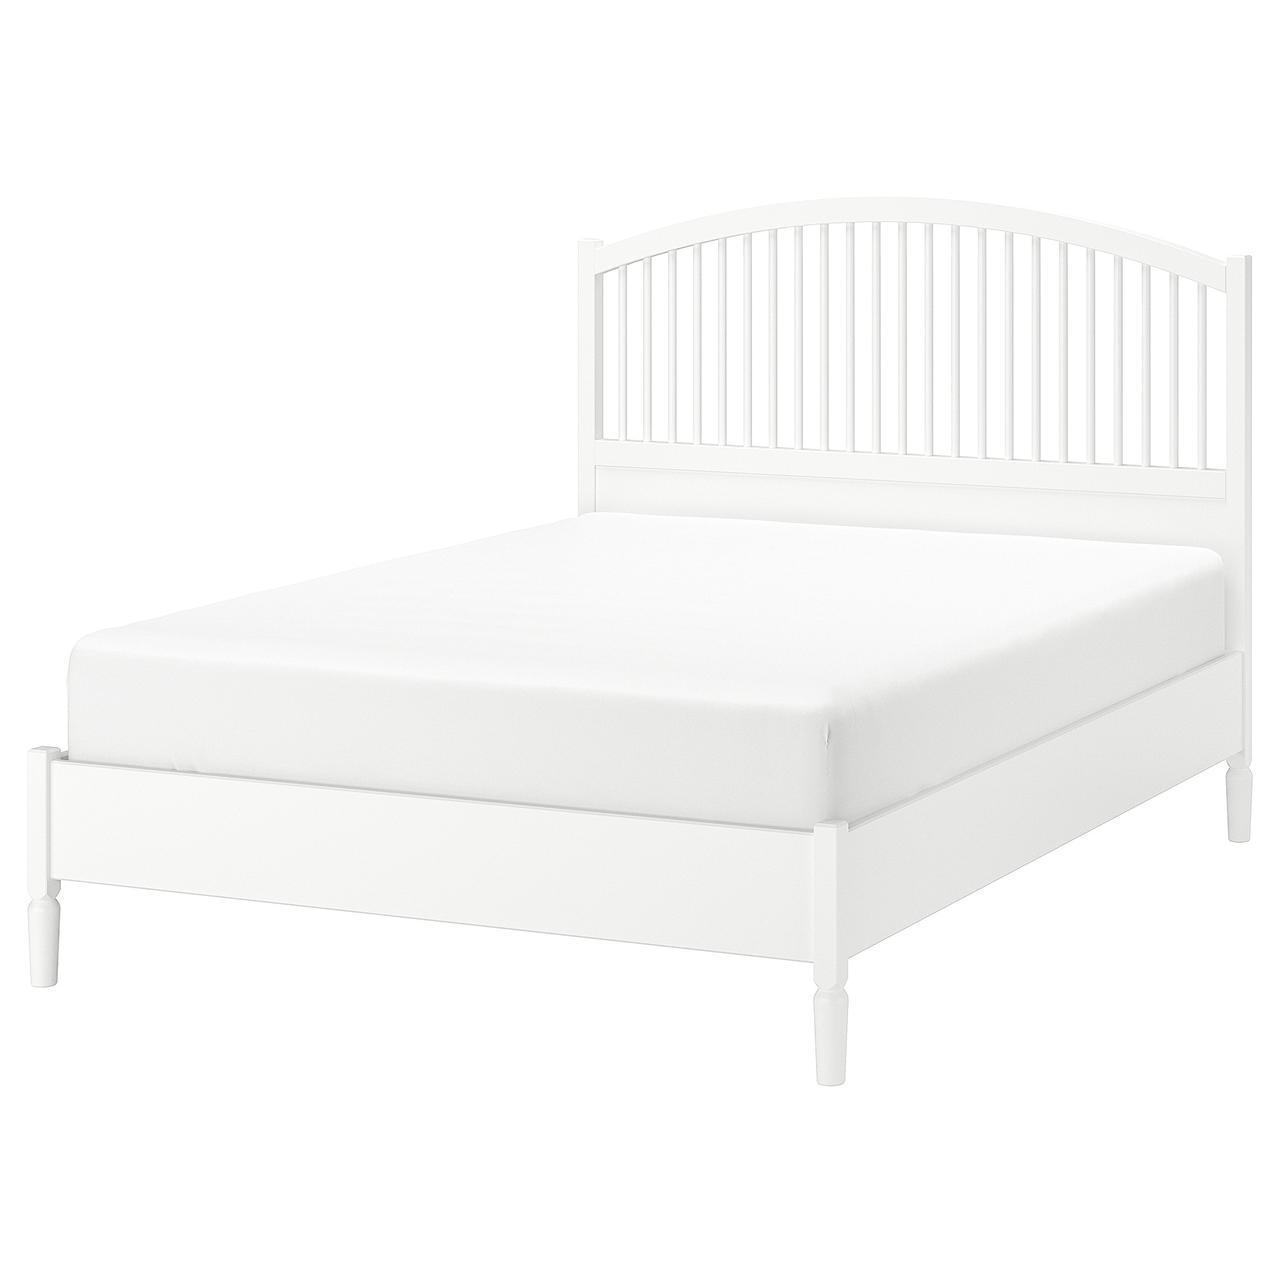 IKEA TYSSEDAL Кровать, белый, Леирсунд  (690.585.88)